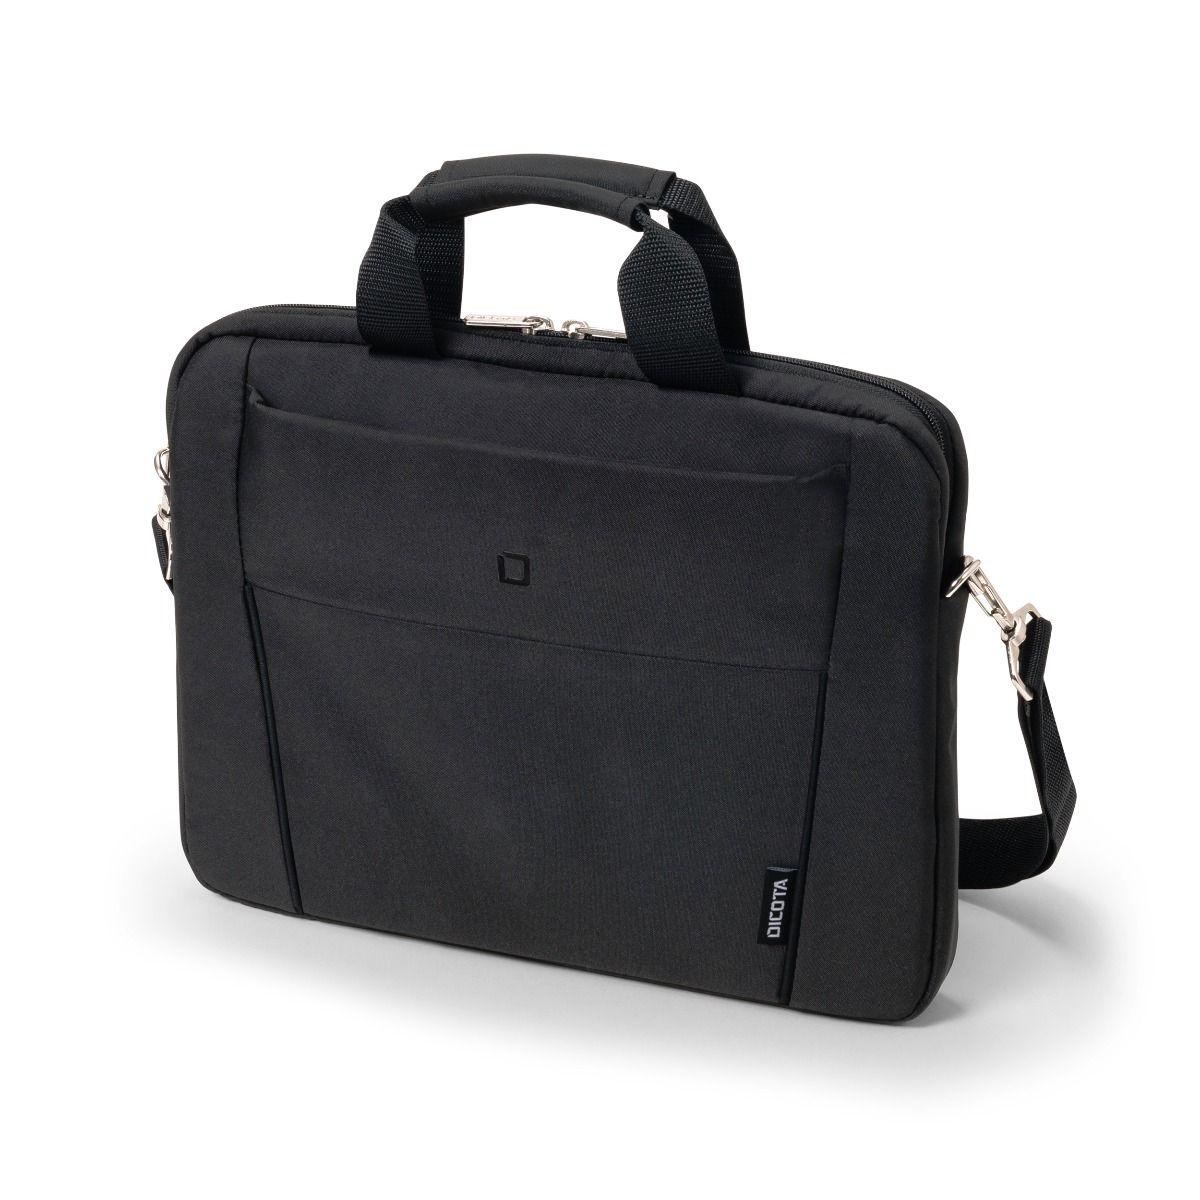 "Dicota Slim Case Base 15-15.6 39.6 cm (15.6"") Messenger case Black"